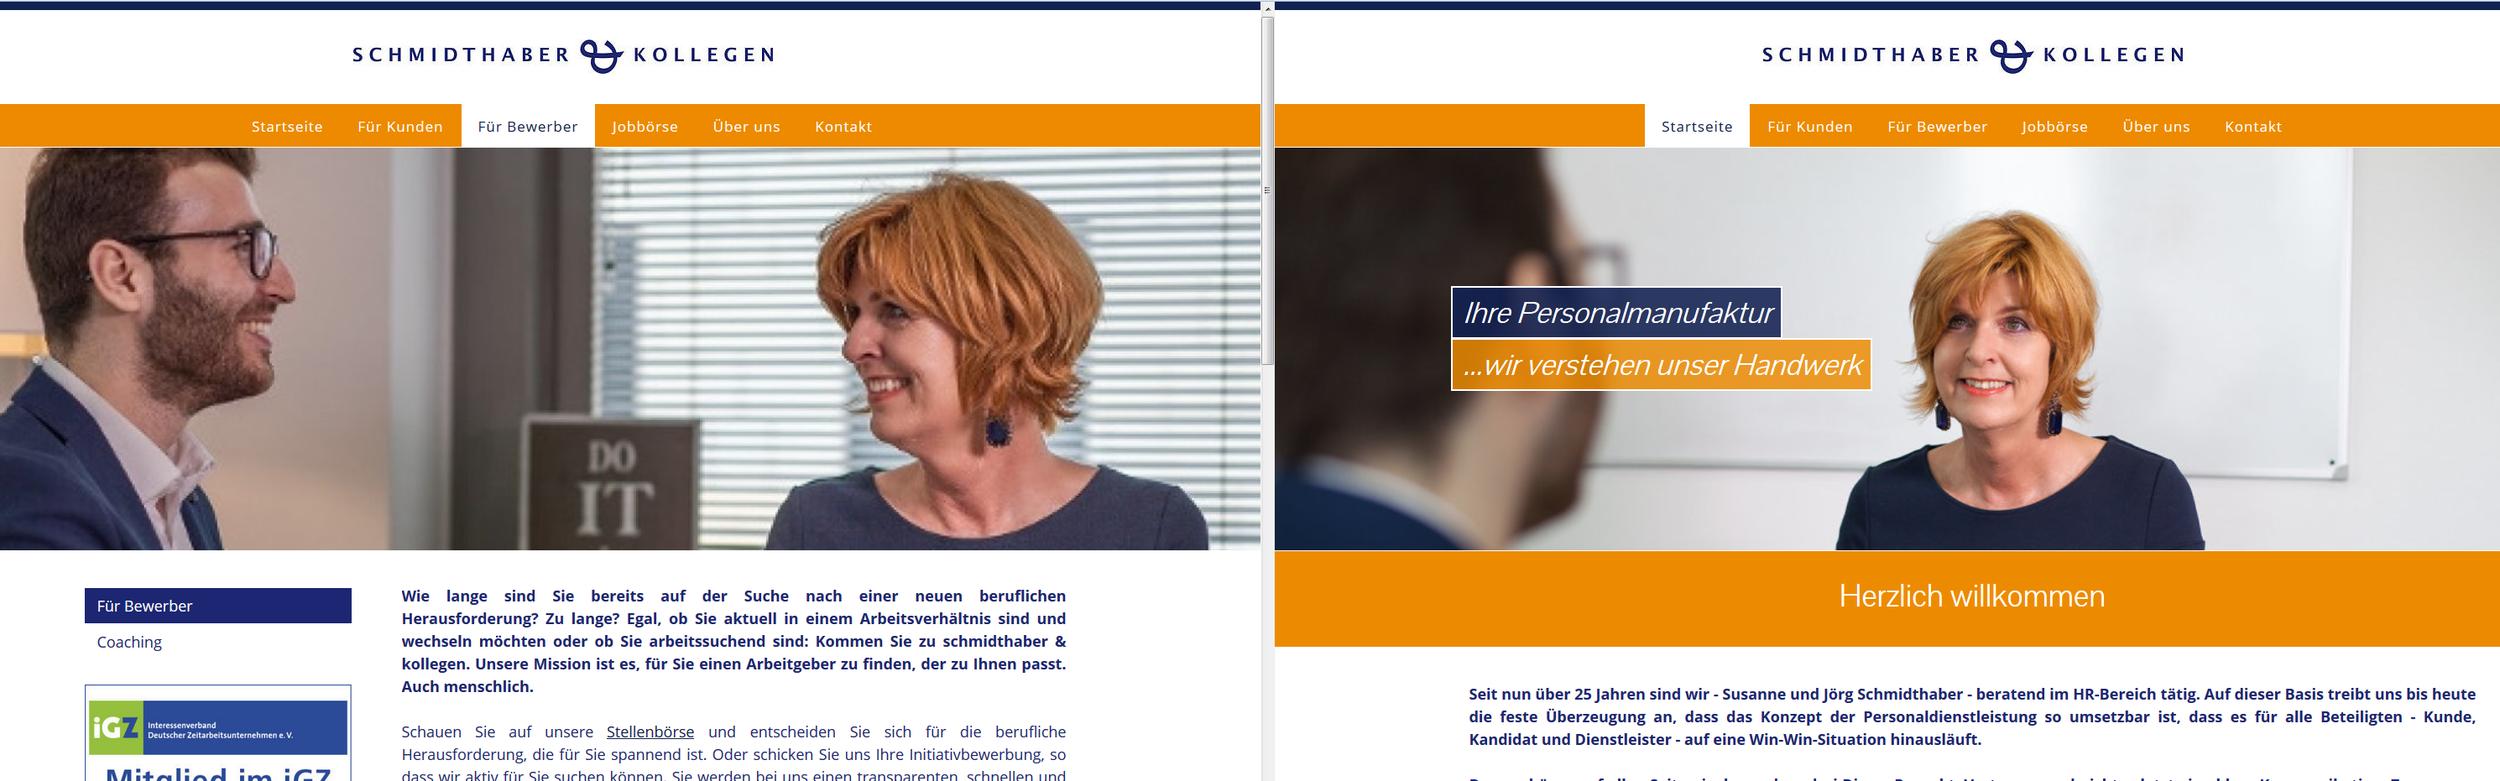 Schmidthaber und Kollegen koko.png